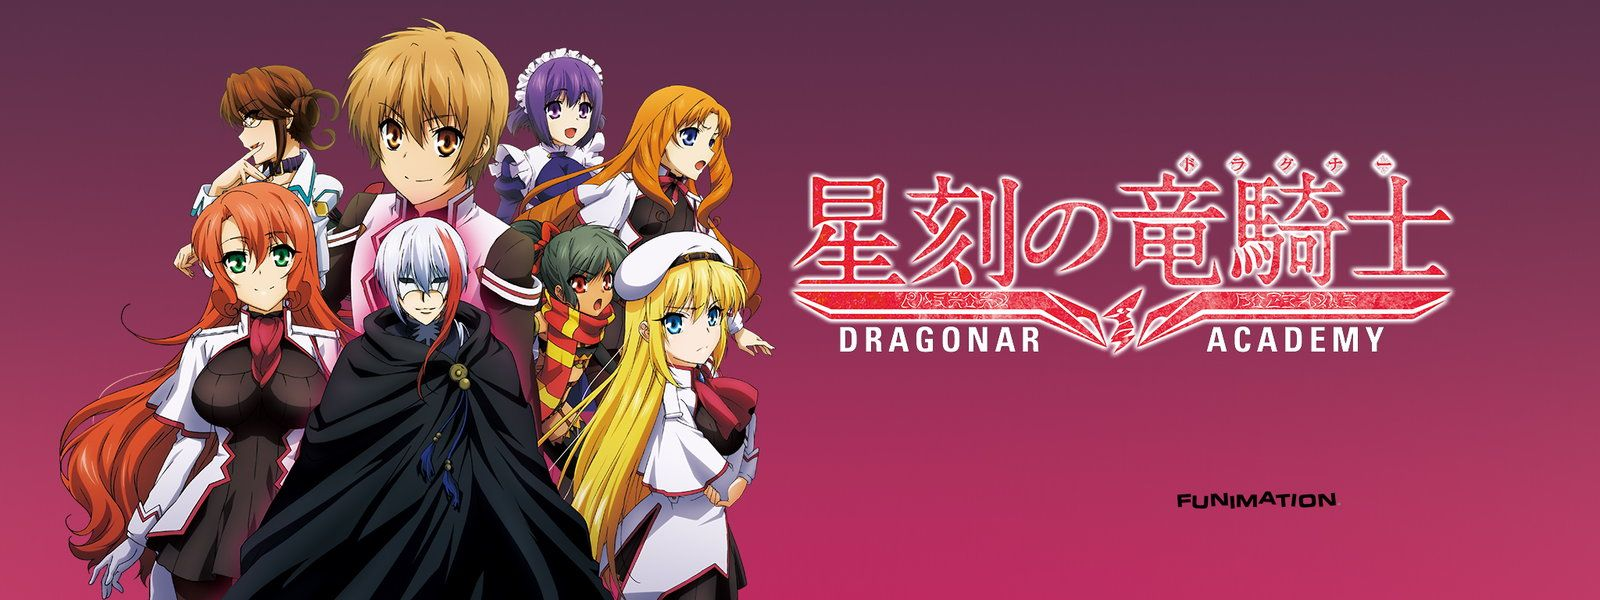 Dragonar academy justdubs online dubbed anime watch